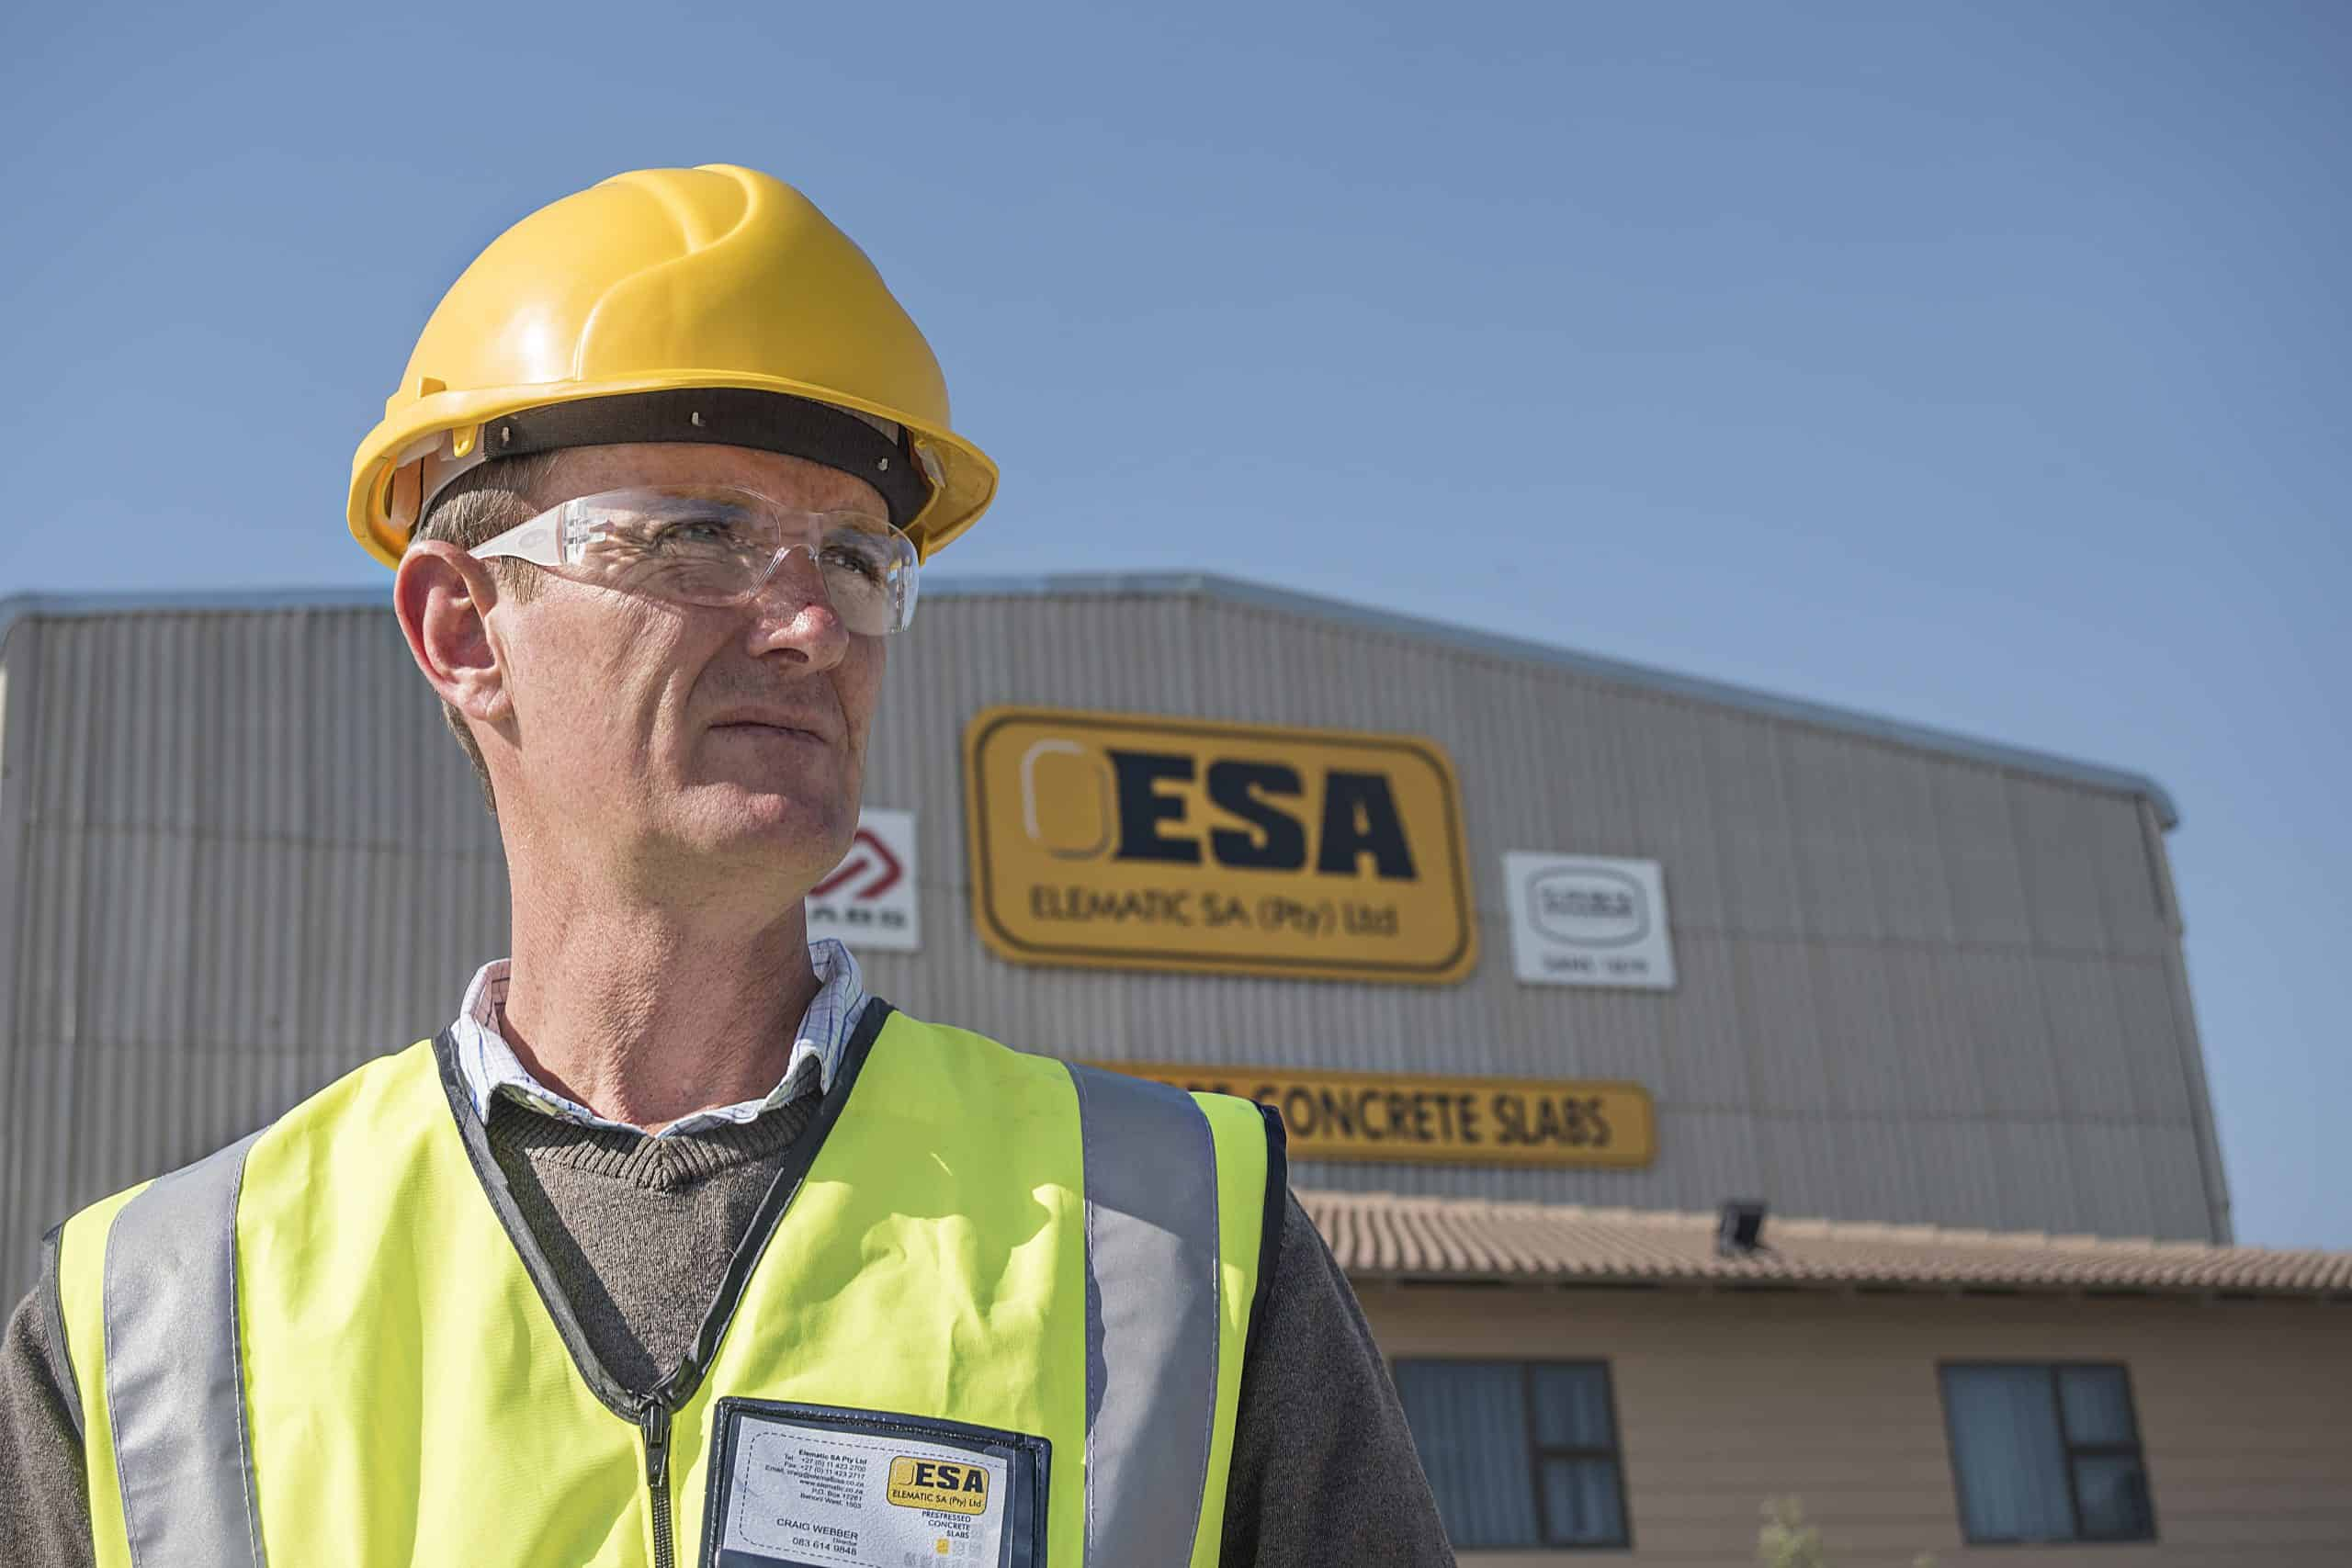 Craig Webber, Director of ESA